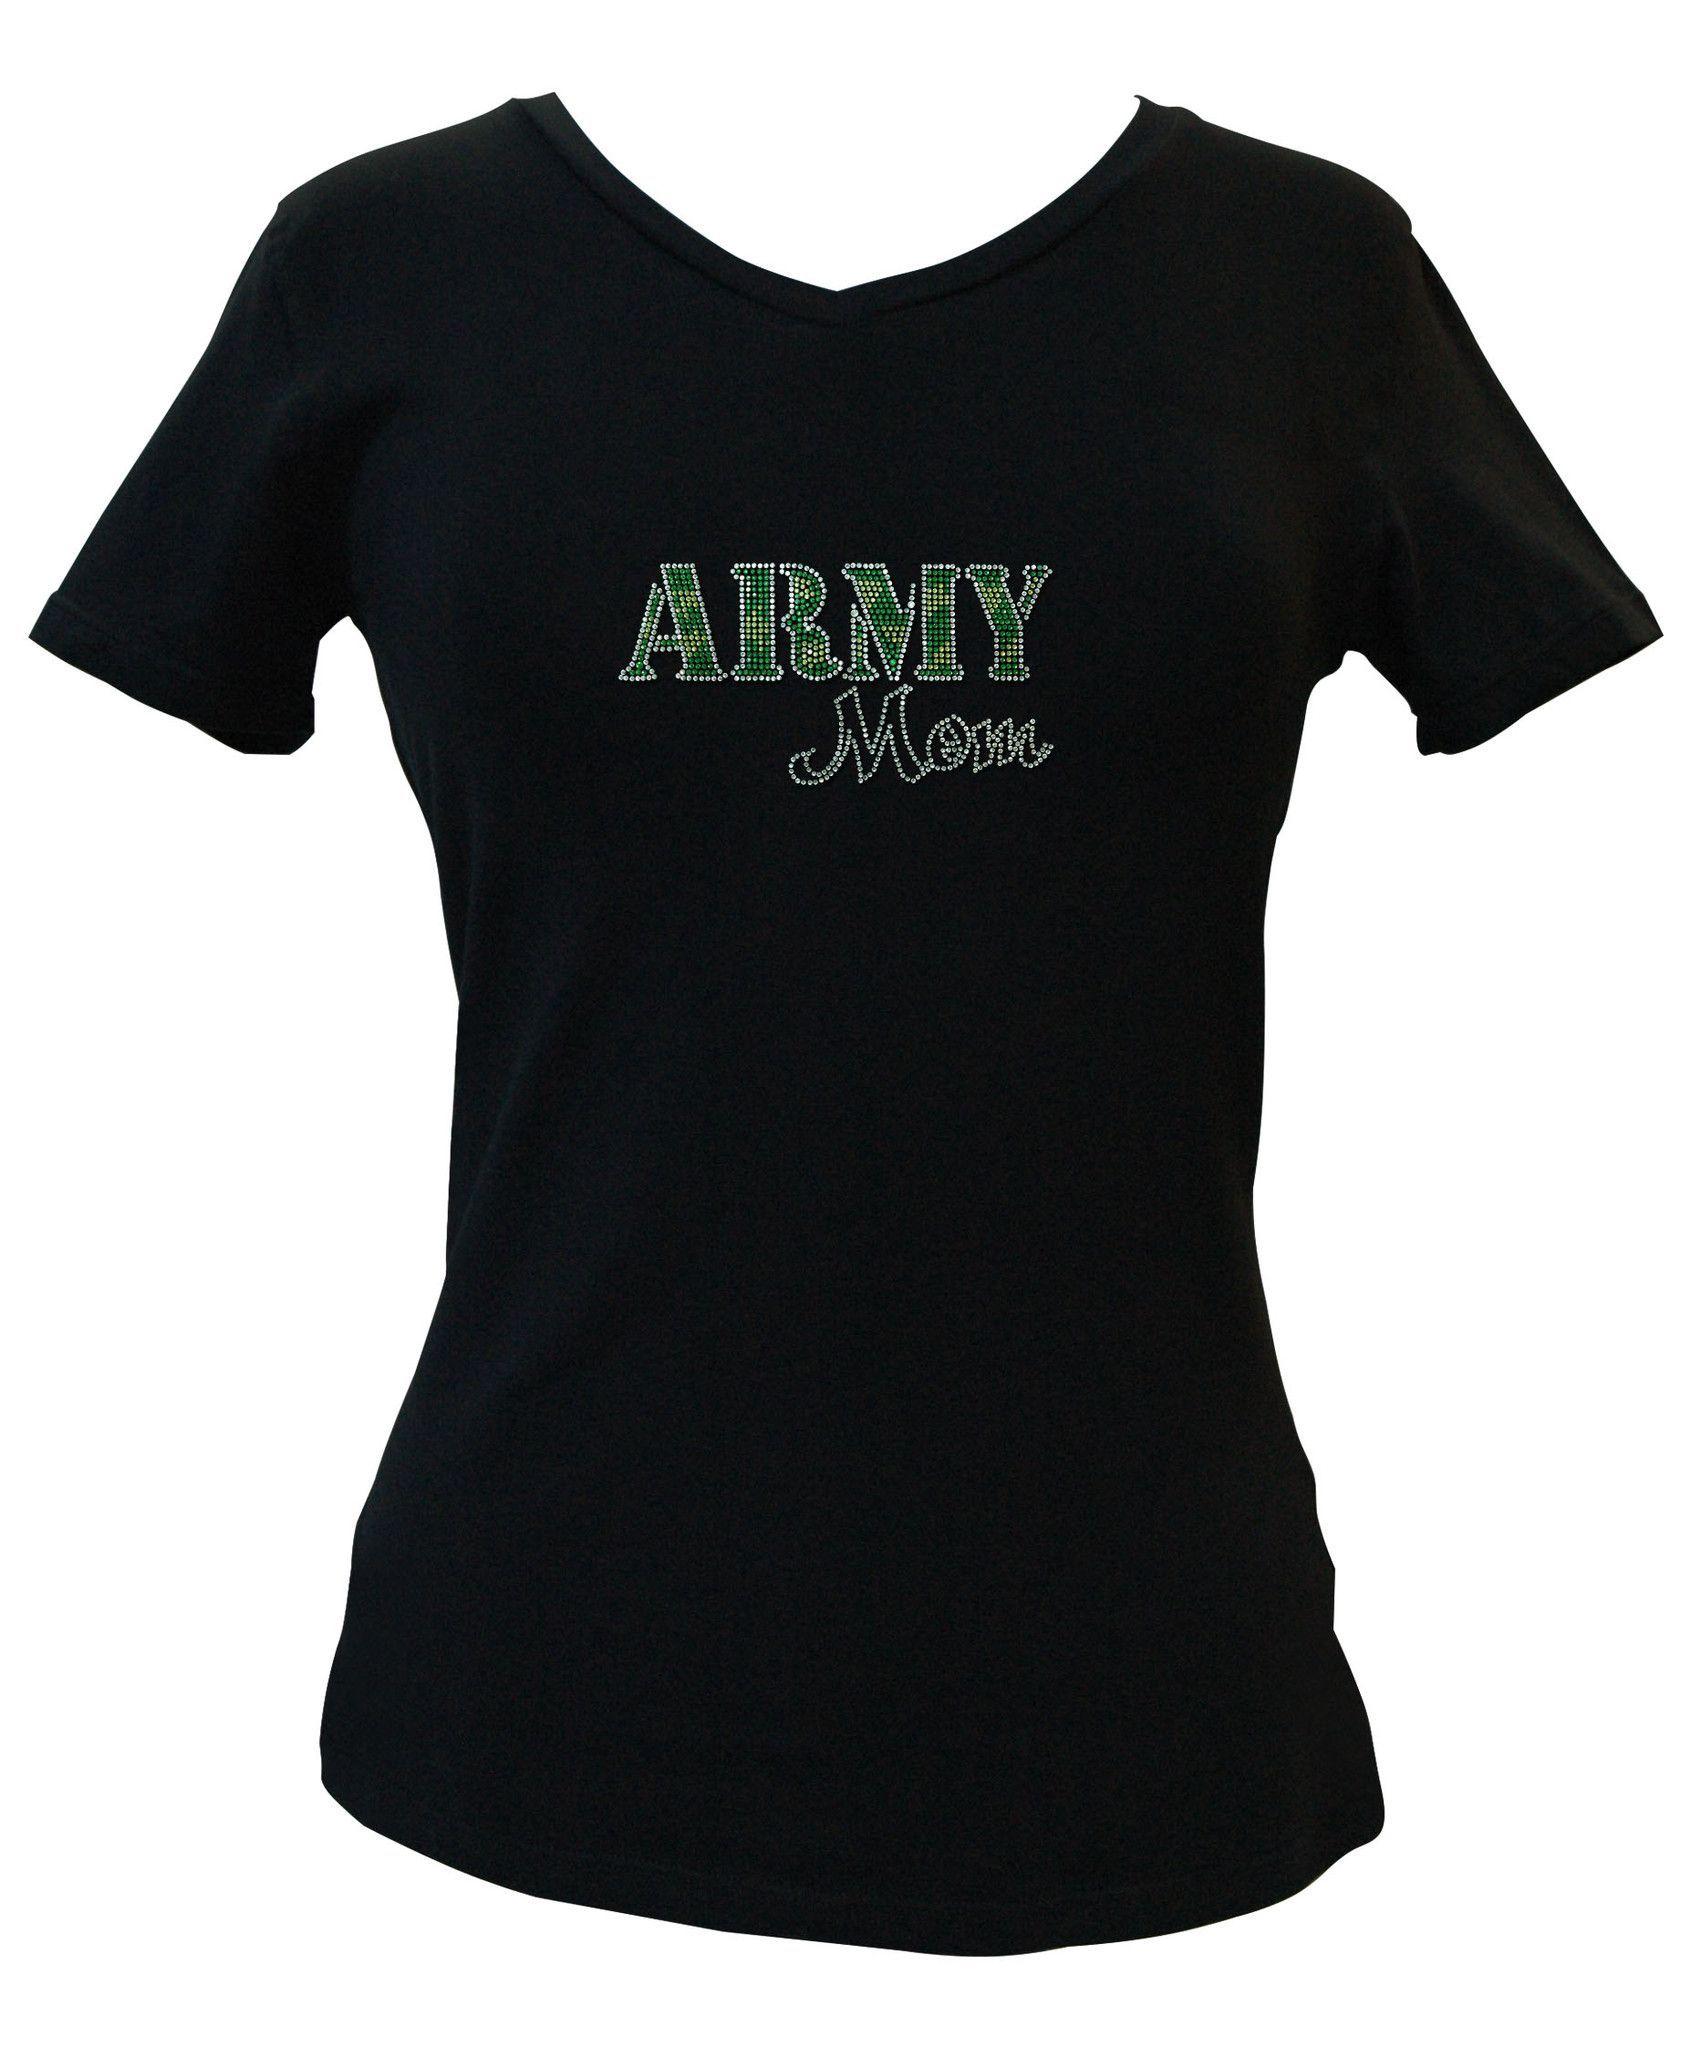 Army mom rhinestone vneck tee army mom and products